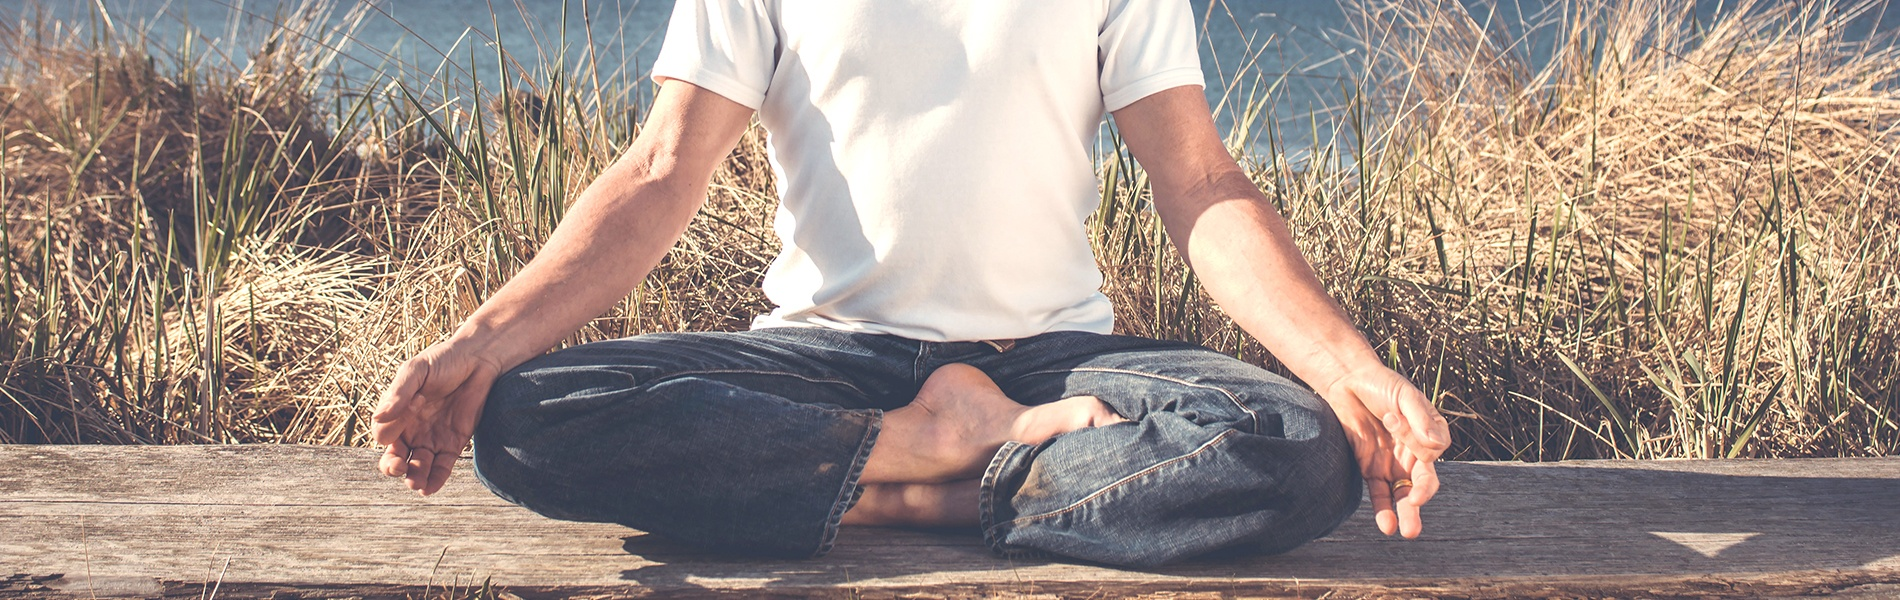 The-Man-y-Benefits-of-Yoga-for-Men-1900x600.jpg